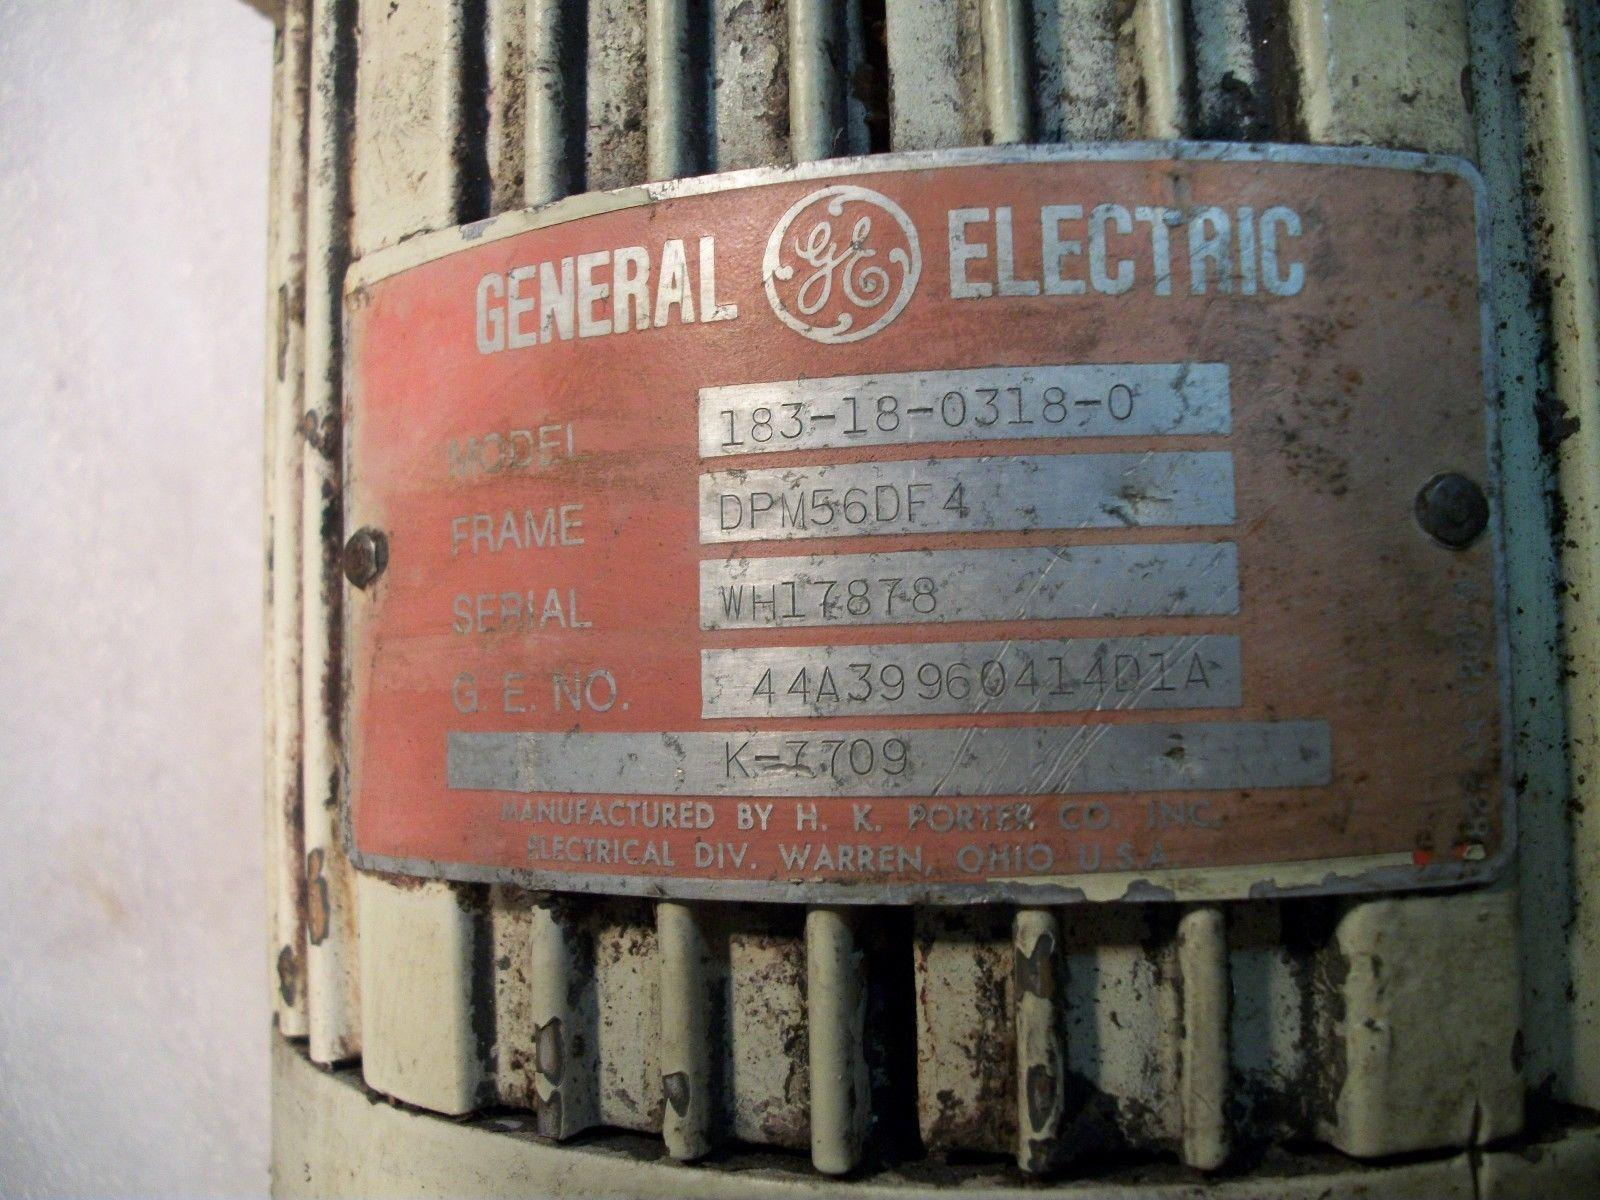 GE Servo Motor 183-18-0318-0 GE# 44A39960414D1A Frame DPM 56DF4